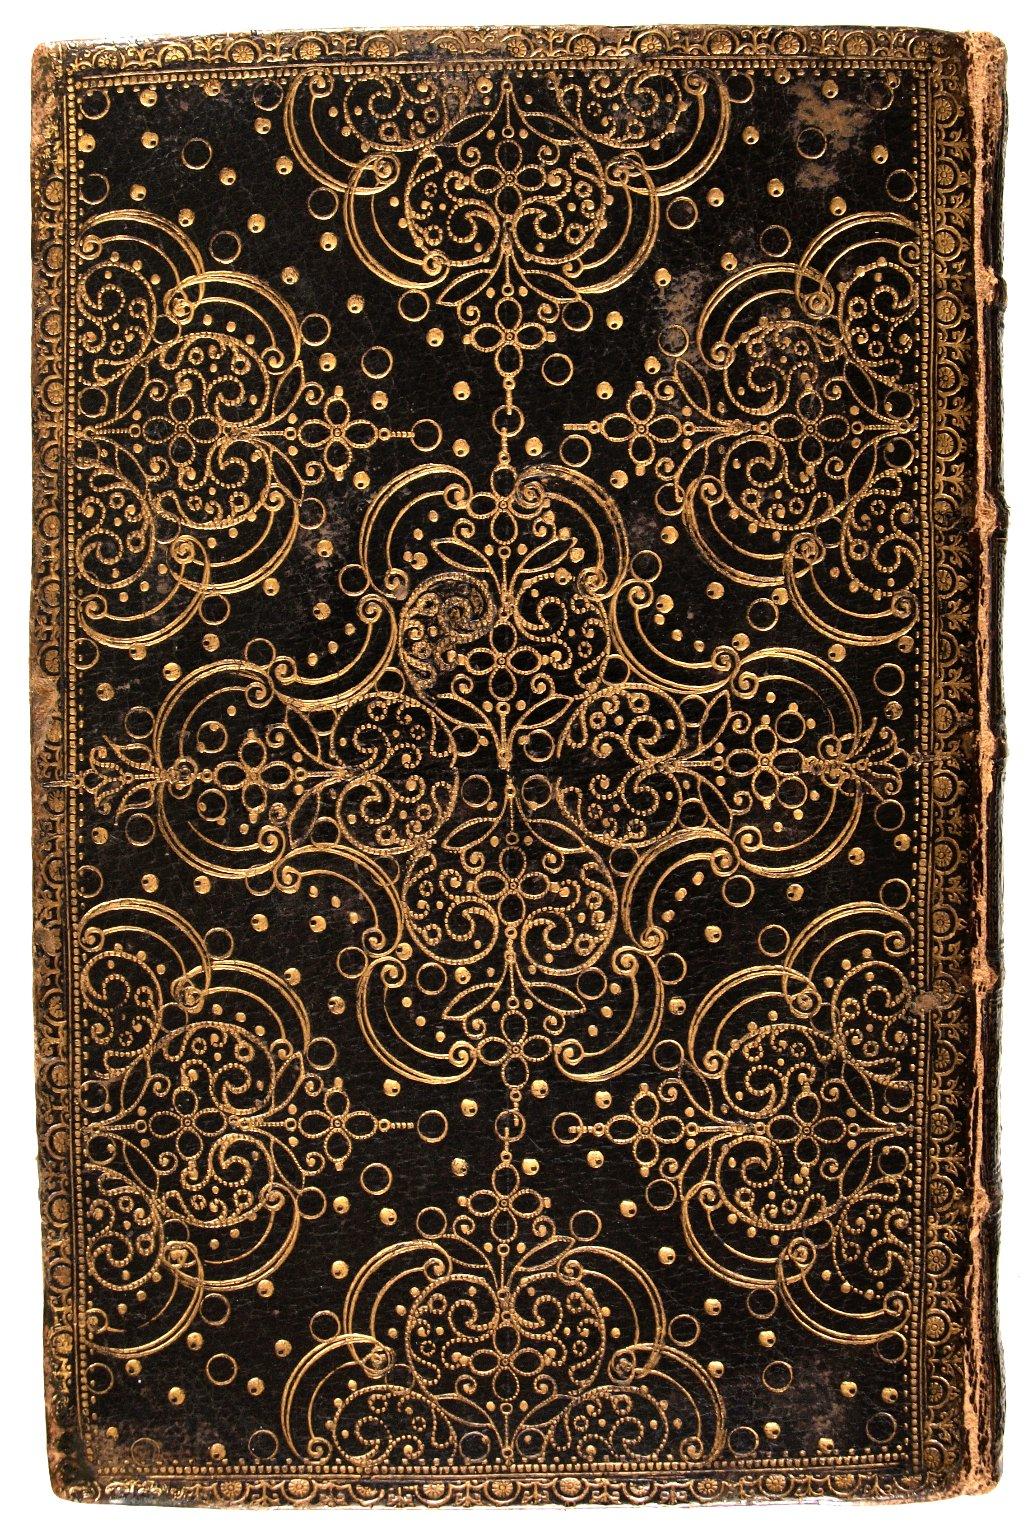 Back cover, B3651.